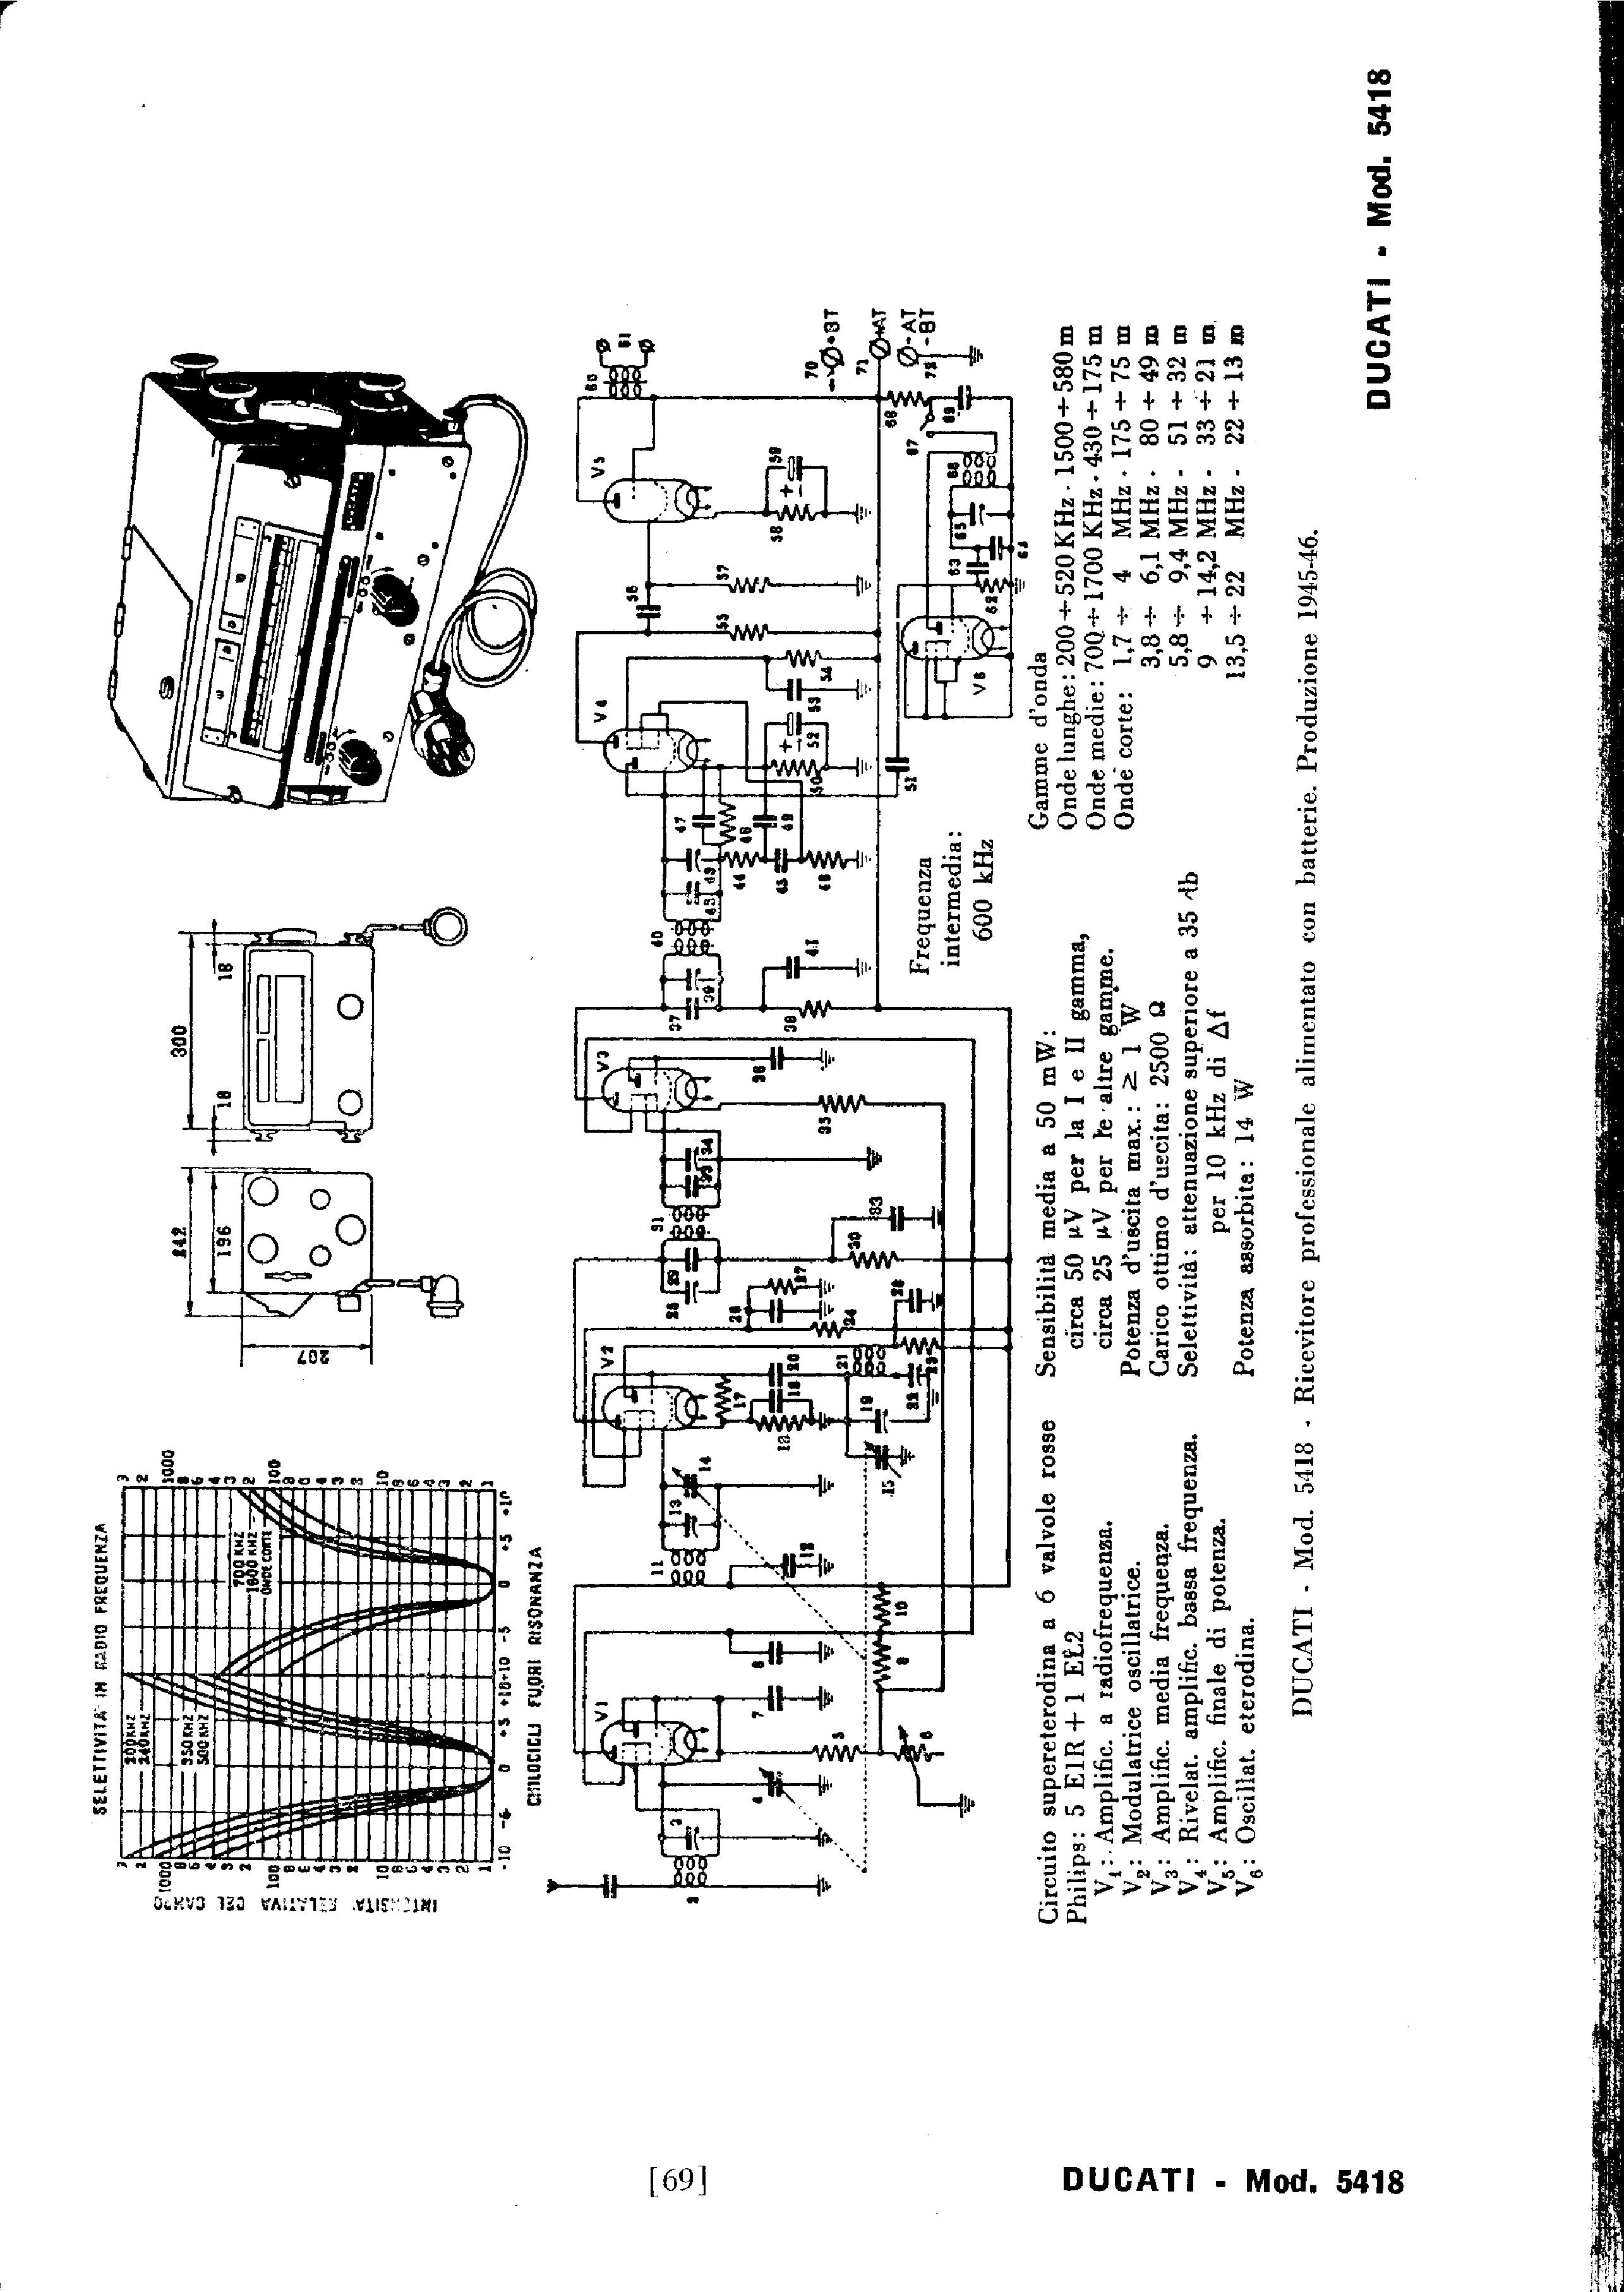 ducati rr5418 sch service manual download  schematics